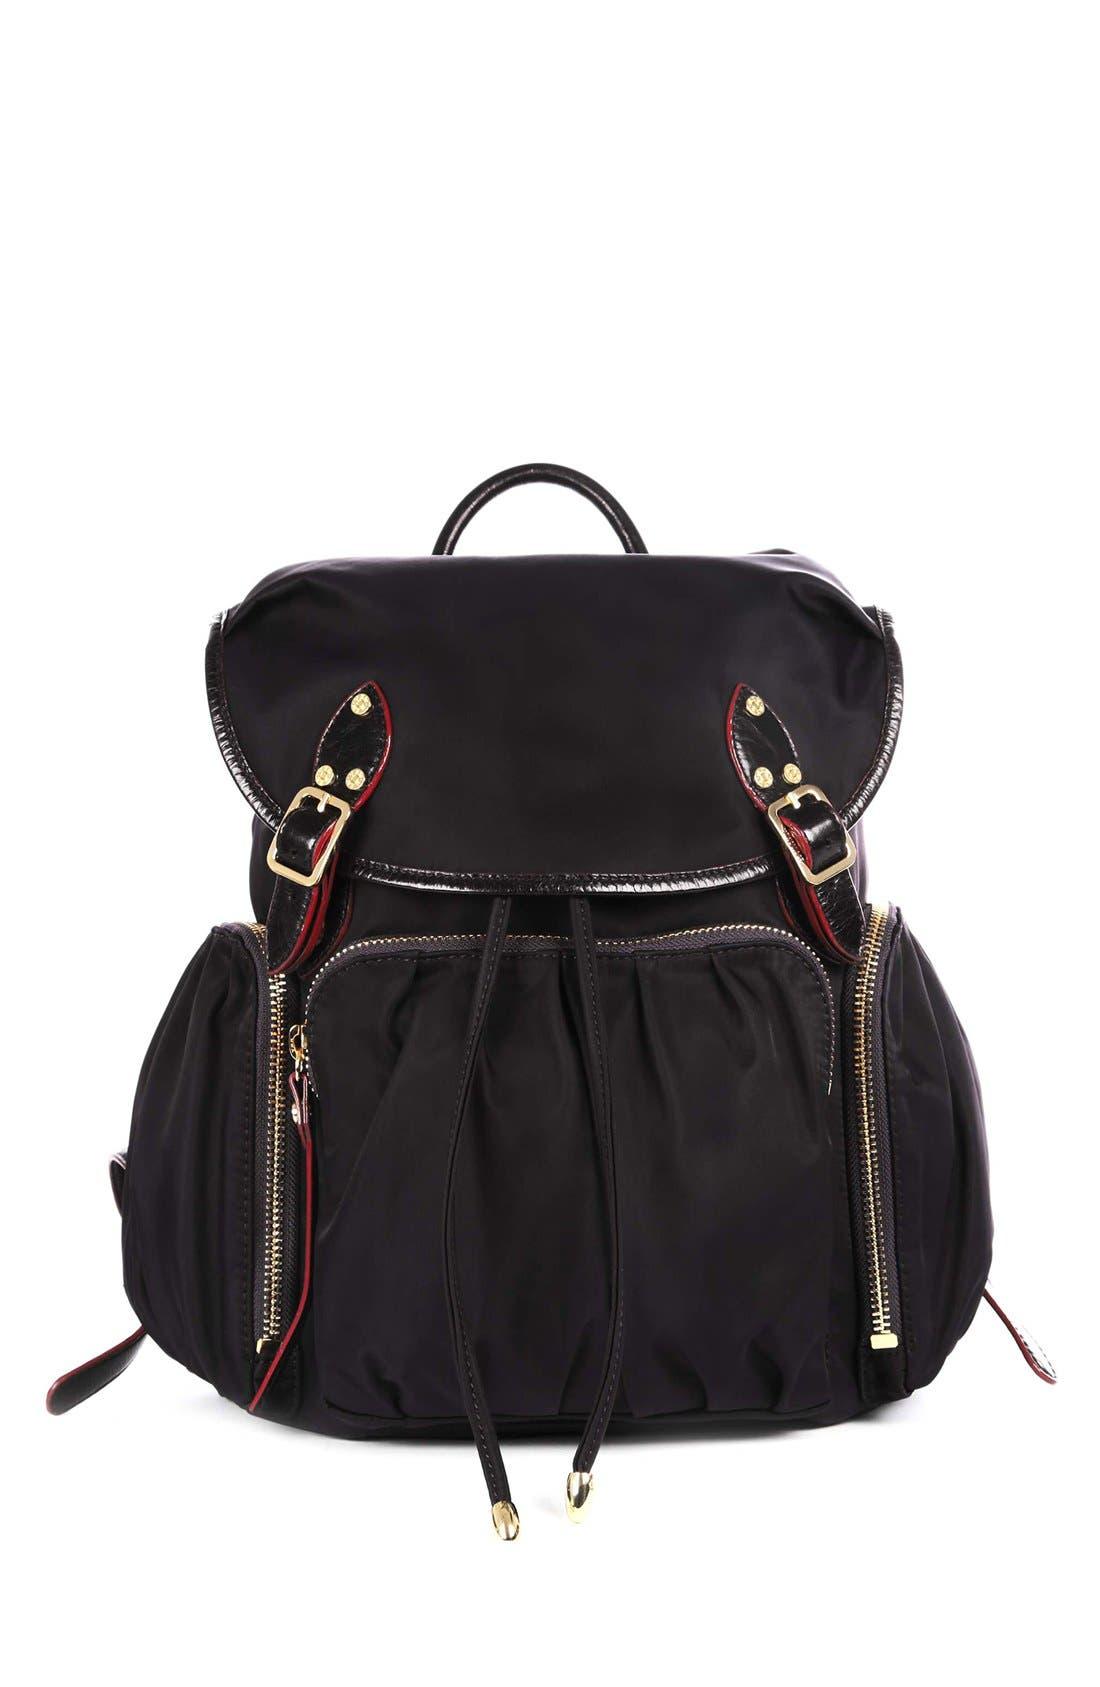 Alternate Image 1 Selected - MZ Wallace 'Marlena' Bedford Nylon Backpack